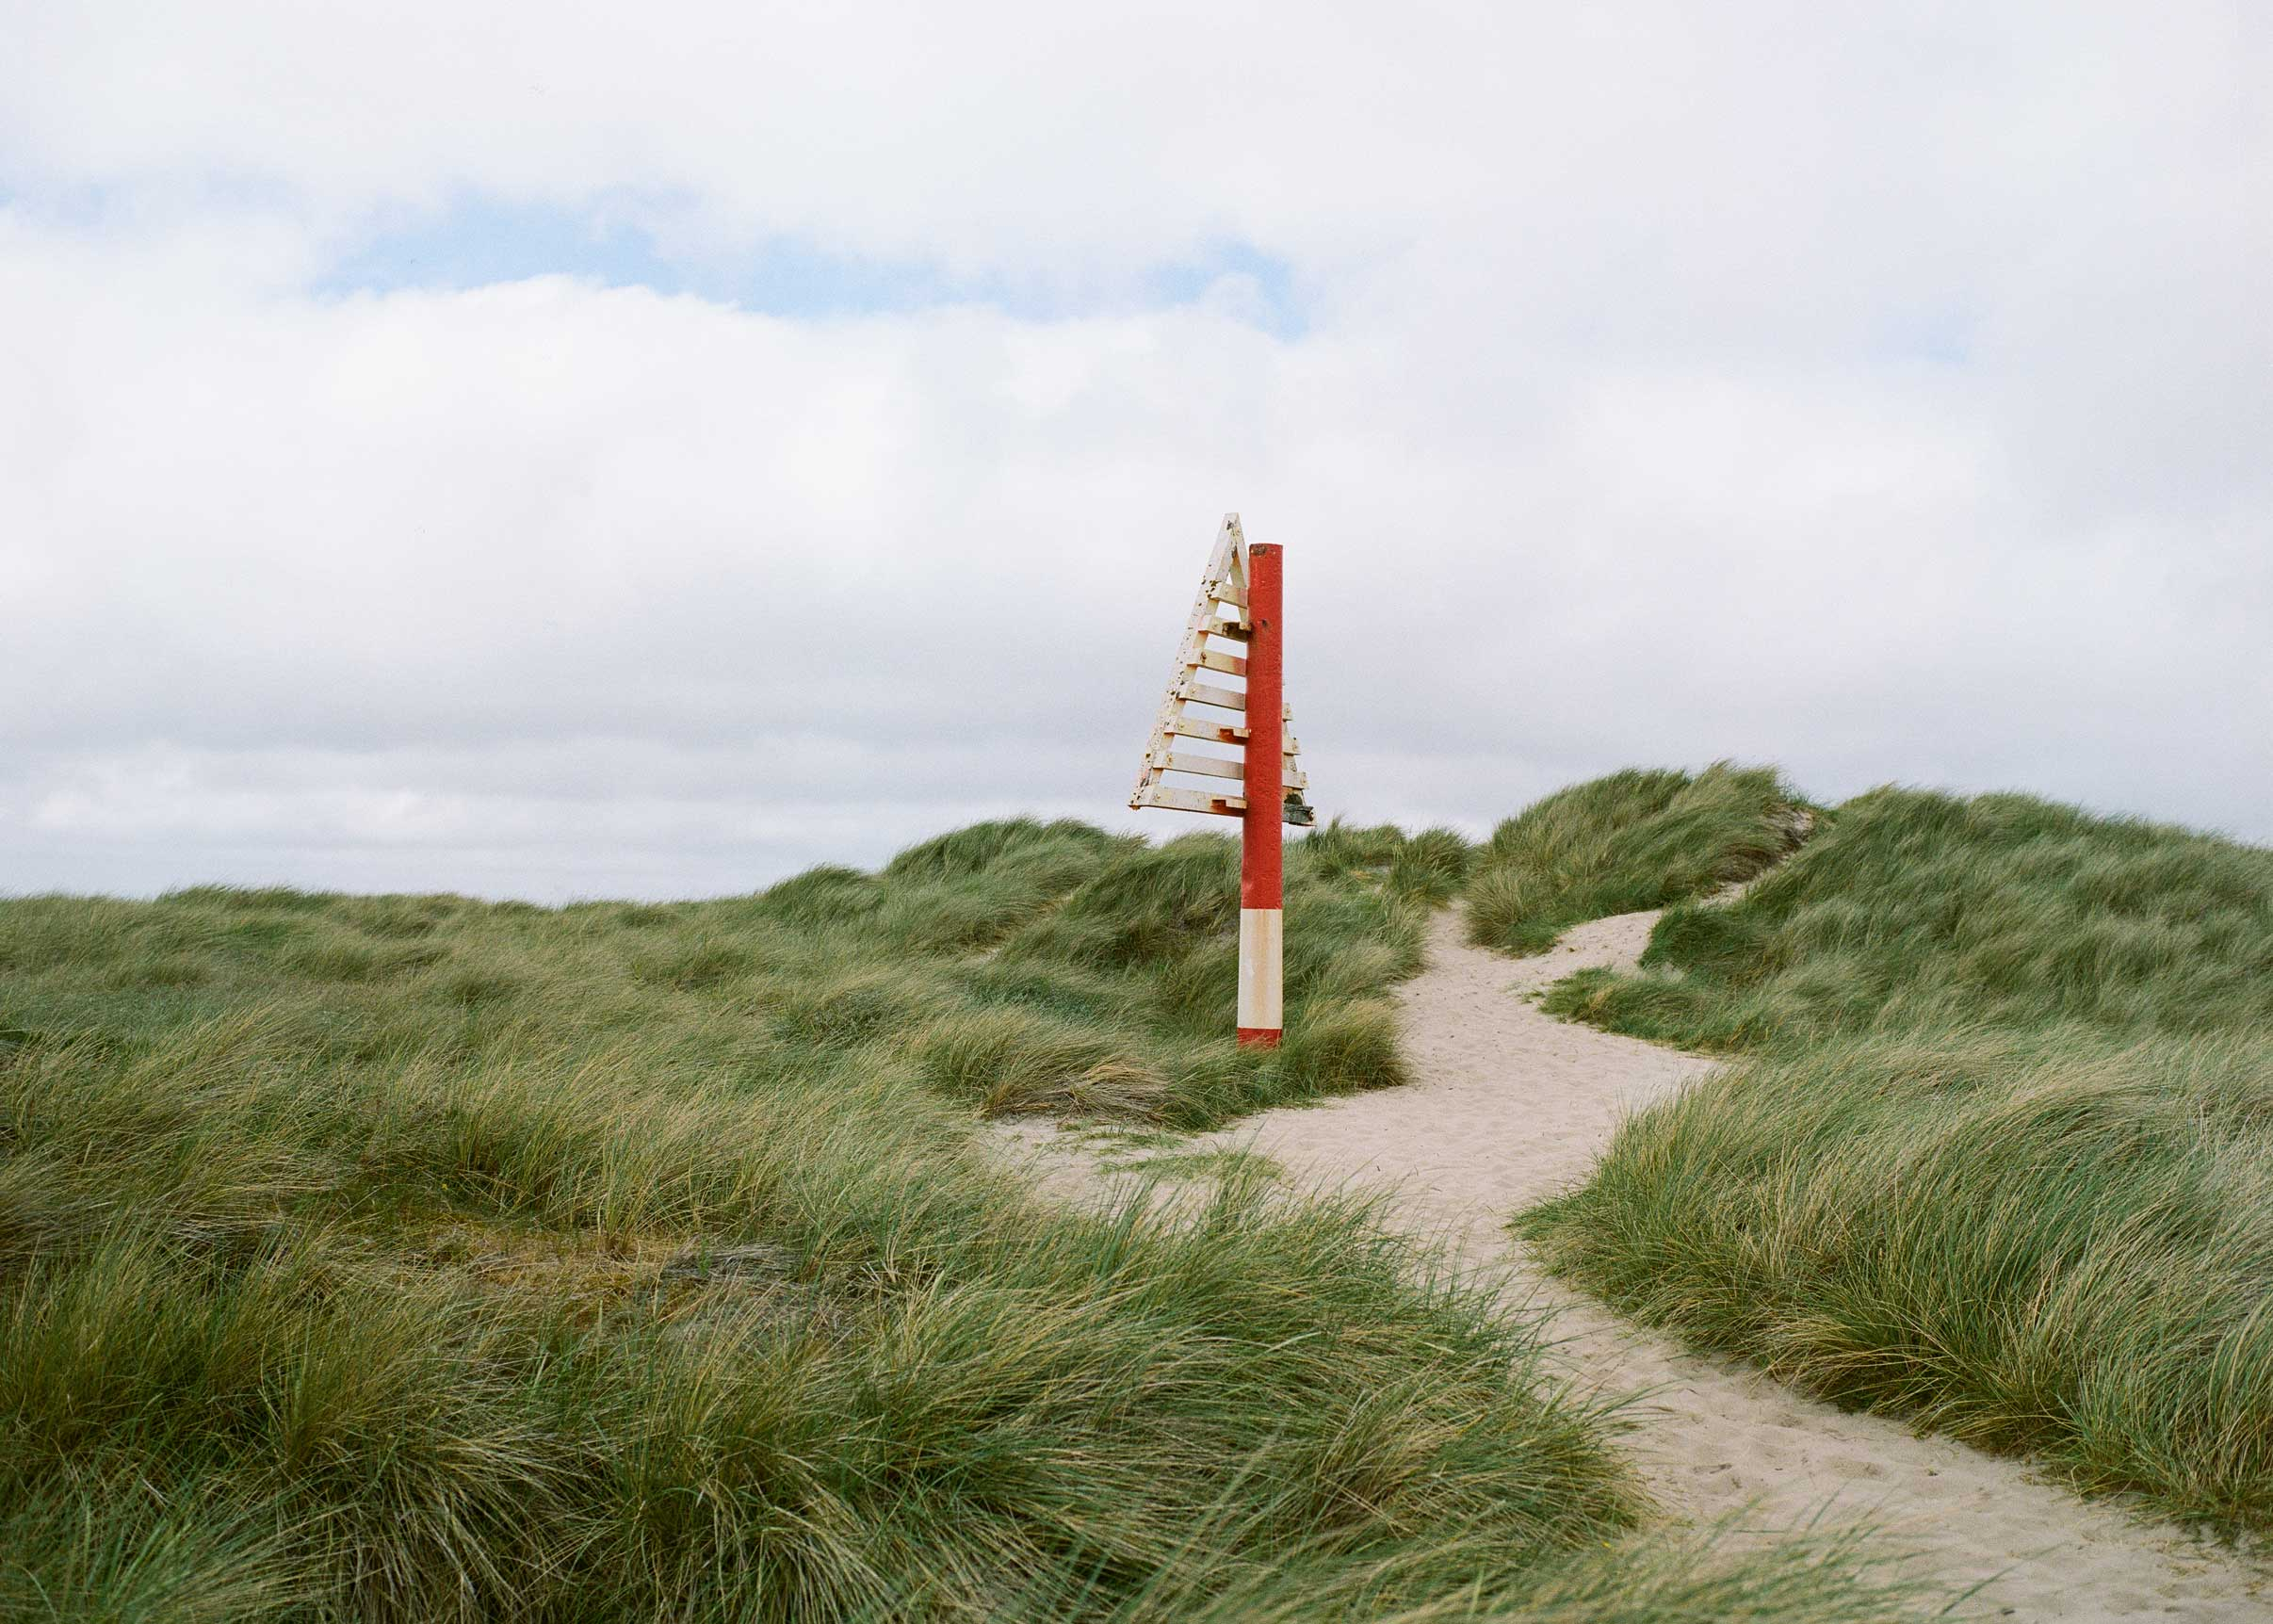 Ellenbogen Sylt (Lennart Filthuth - Mamiya 645, Kodak Portra 400)